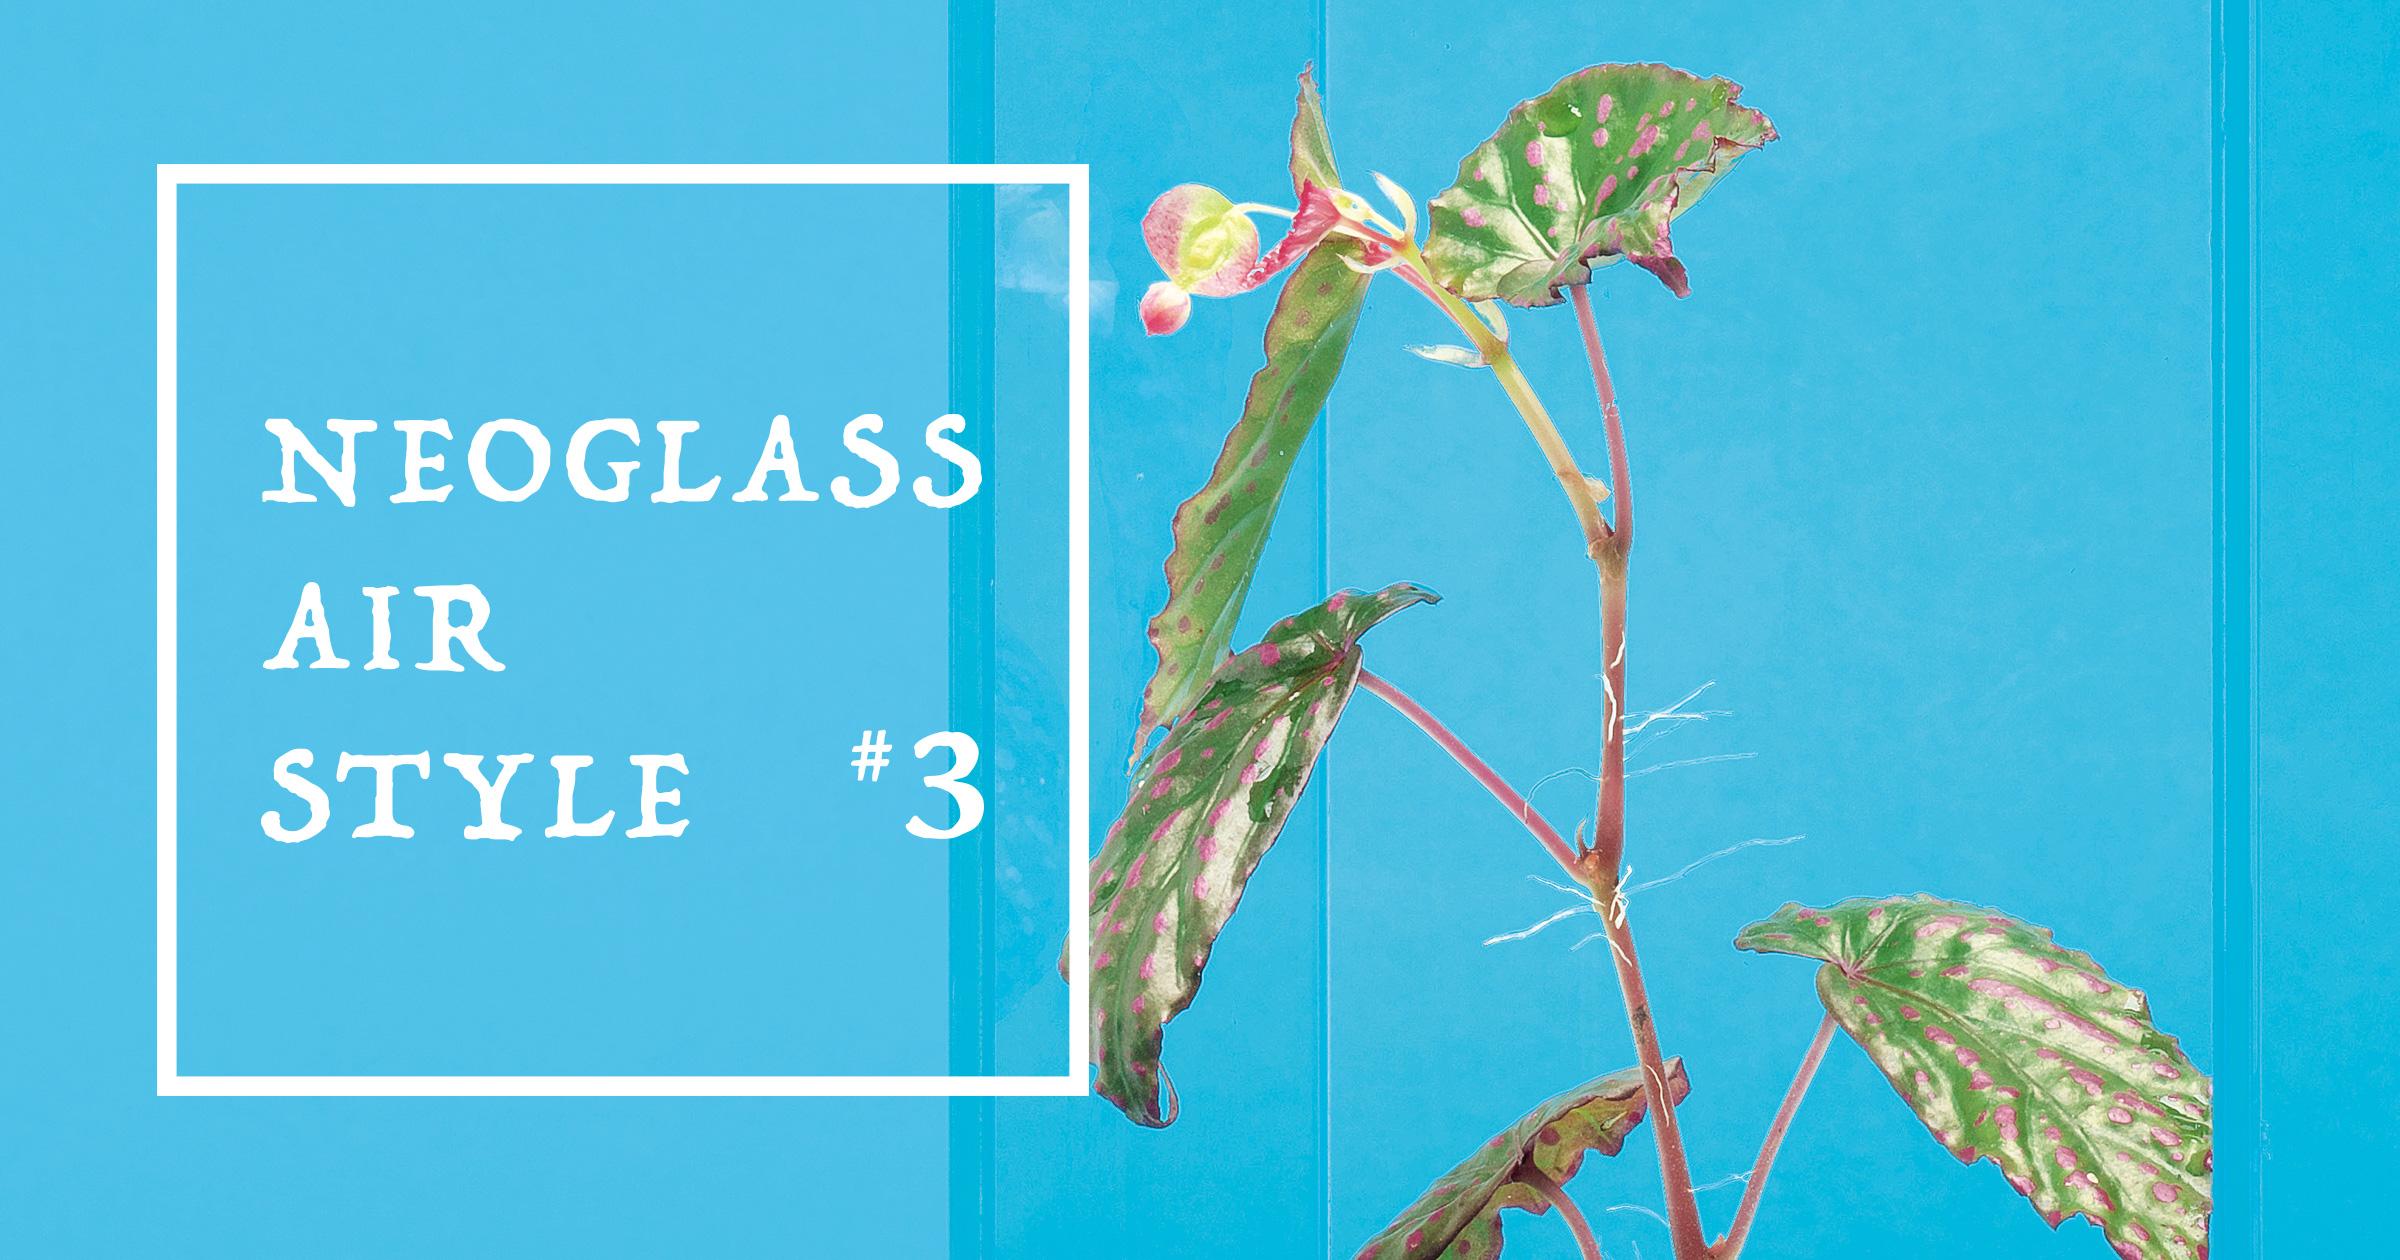 NEOGLASS AIR STYLE #3